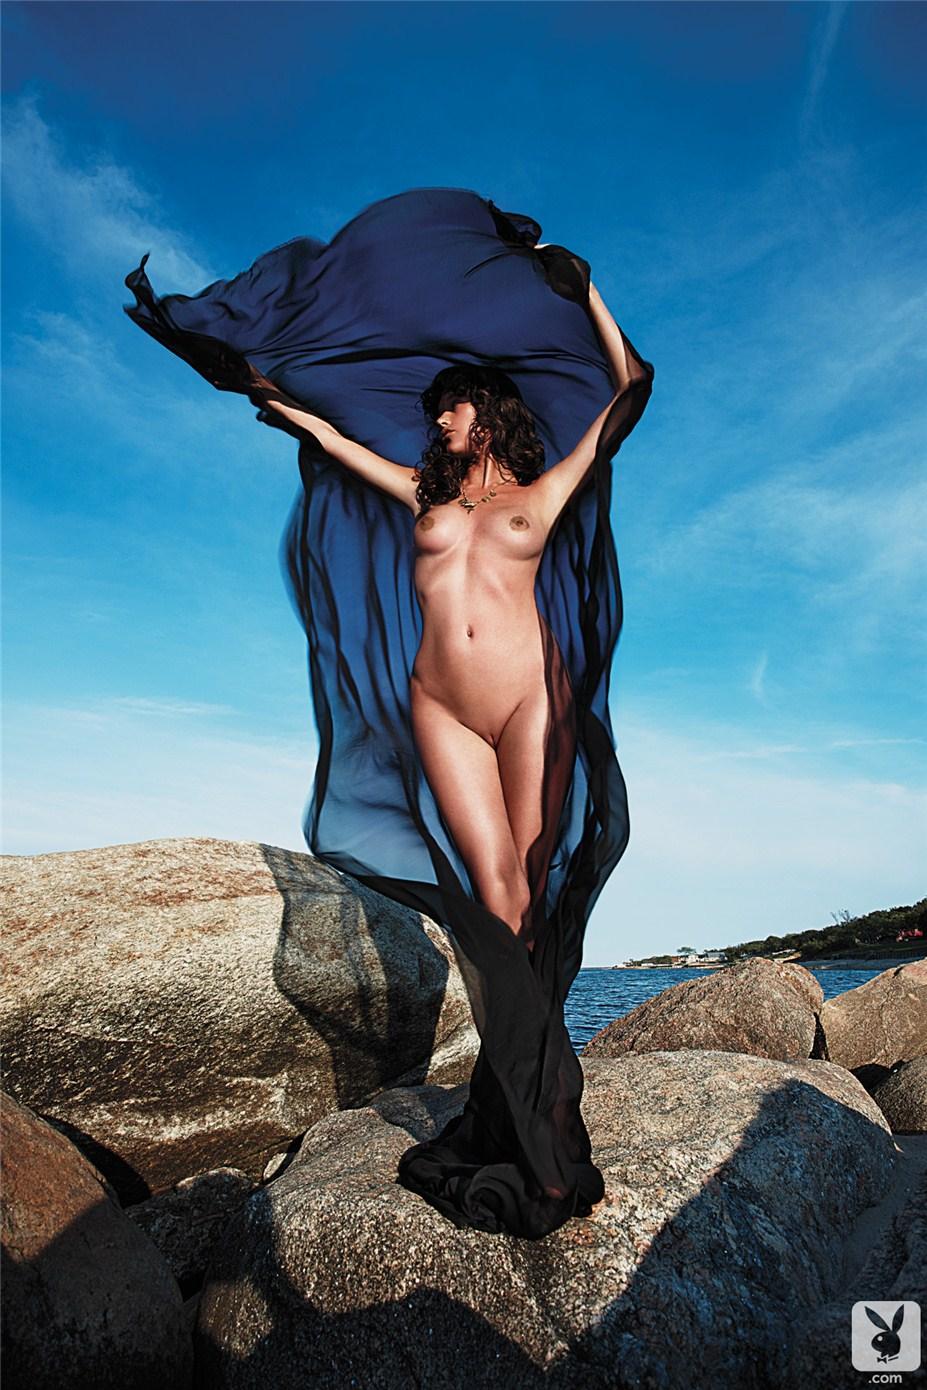 актриса Пас де ла Уэрта / Paz de la Huerta - Playboy USA january-february 2013